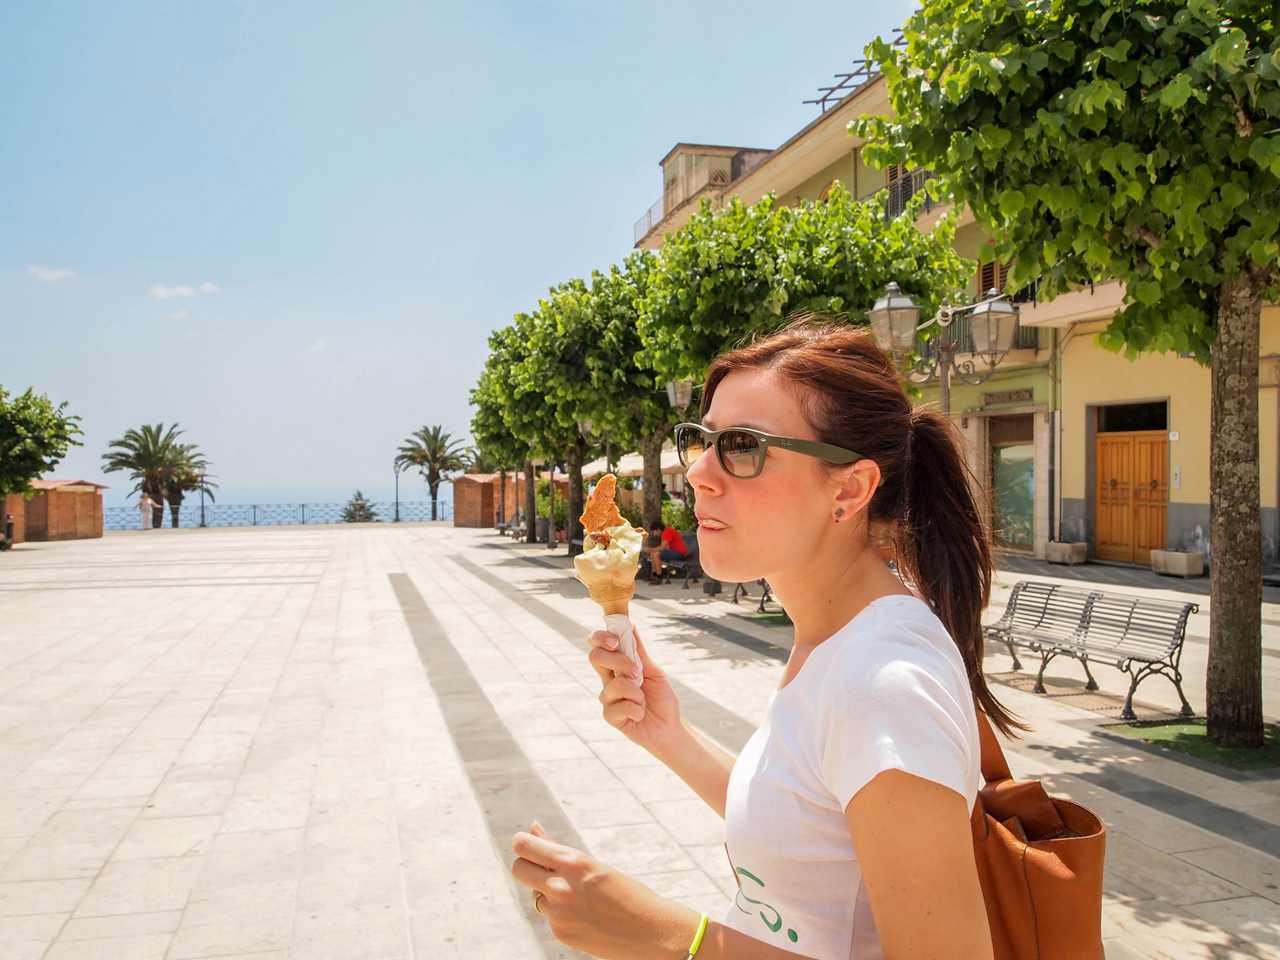 Enjoying the best gelato on the main square of Zafferana Etnea